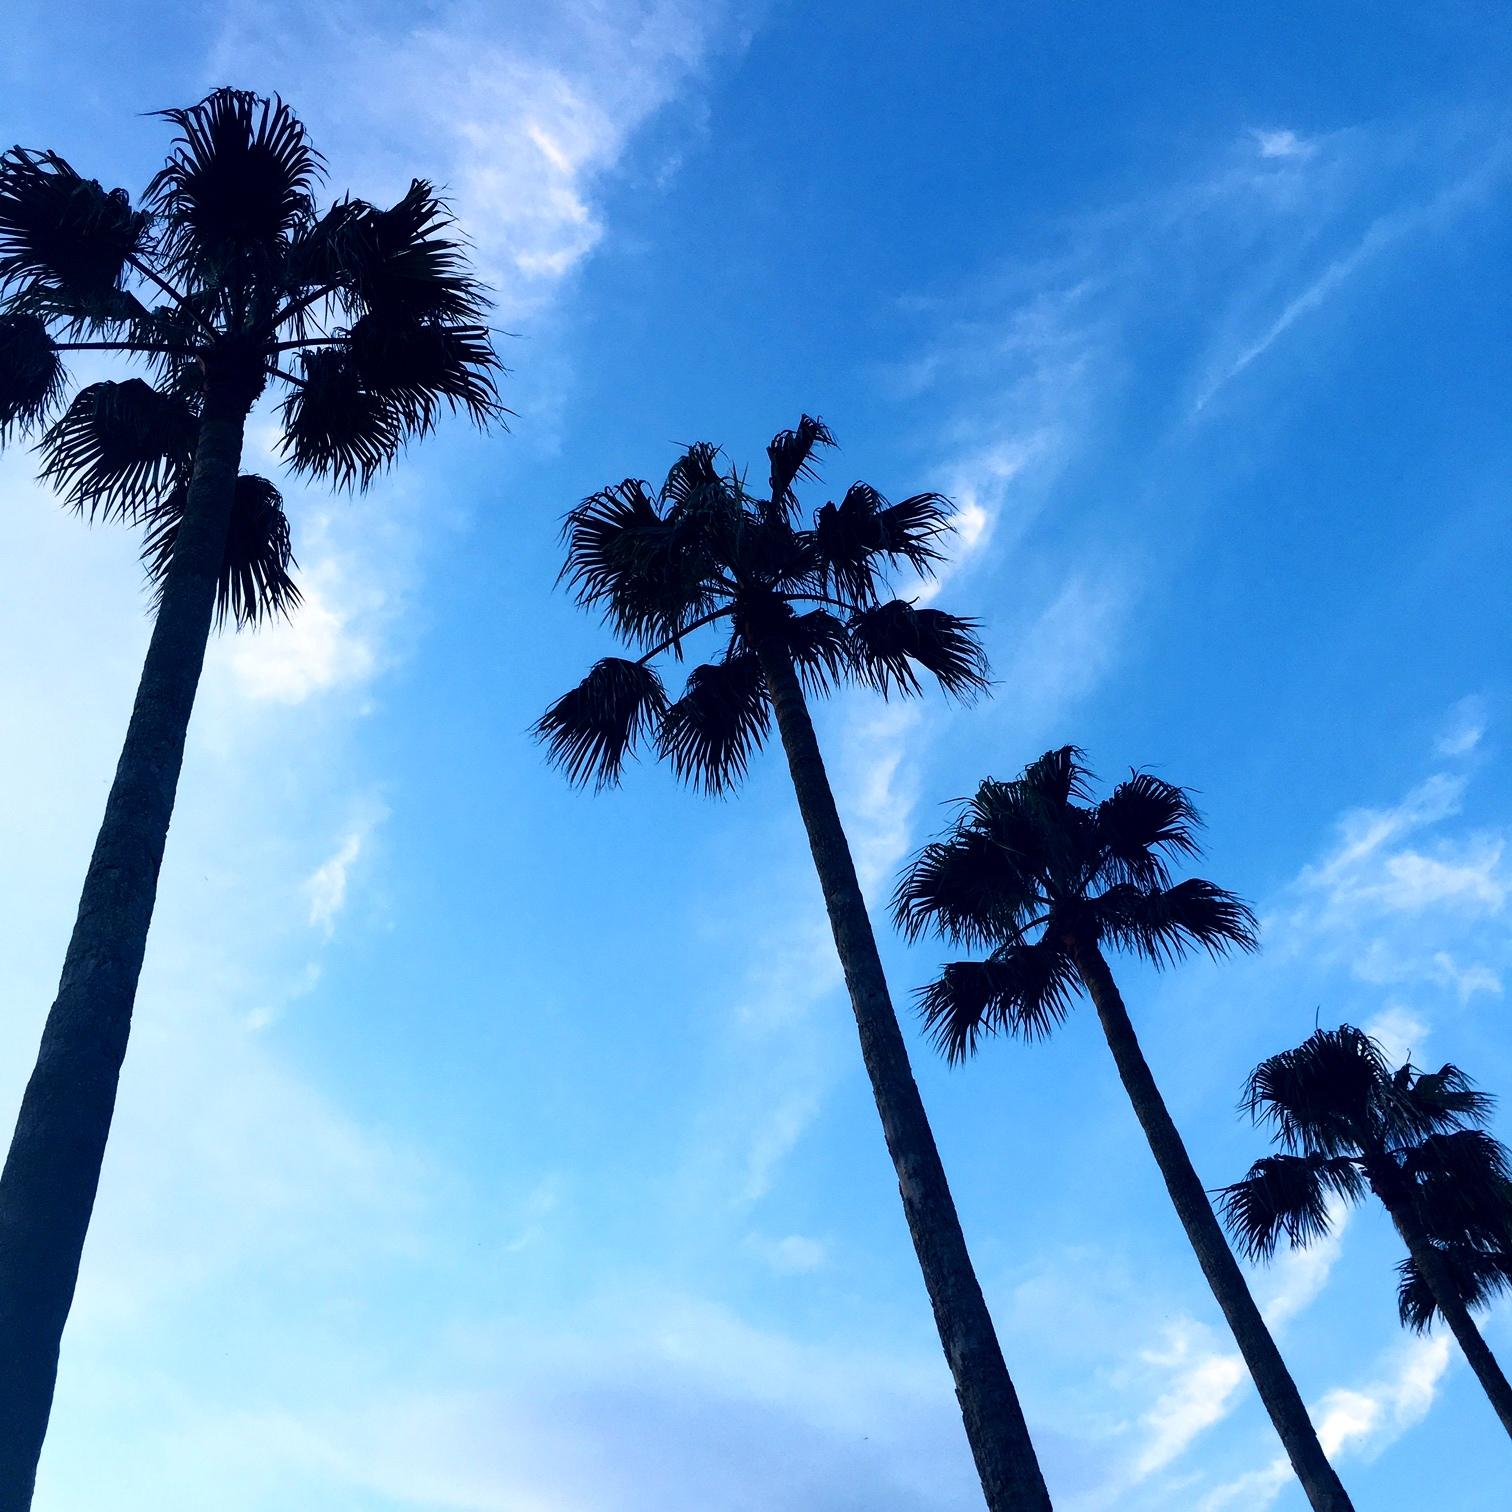 鎌倉, 逗子,湘南, 海,beach,ビーチ